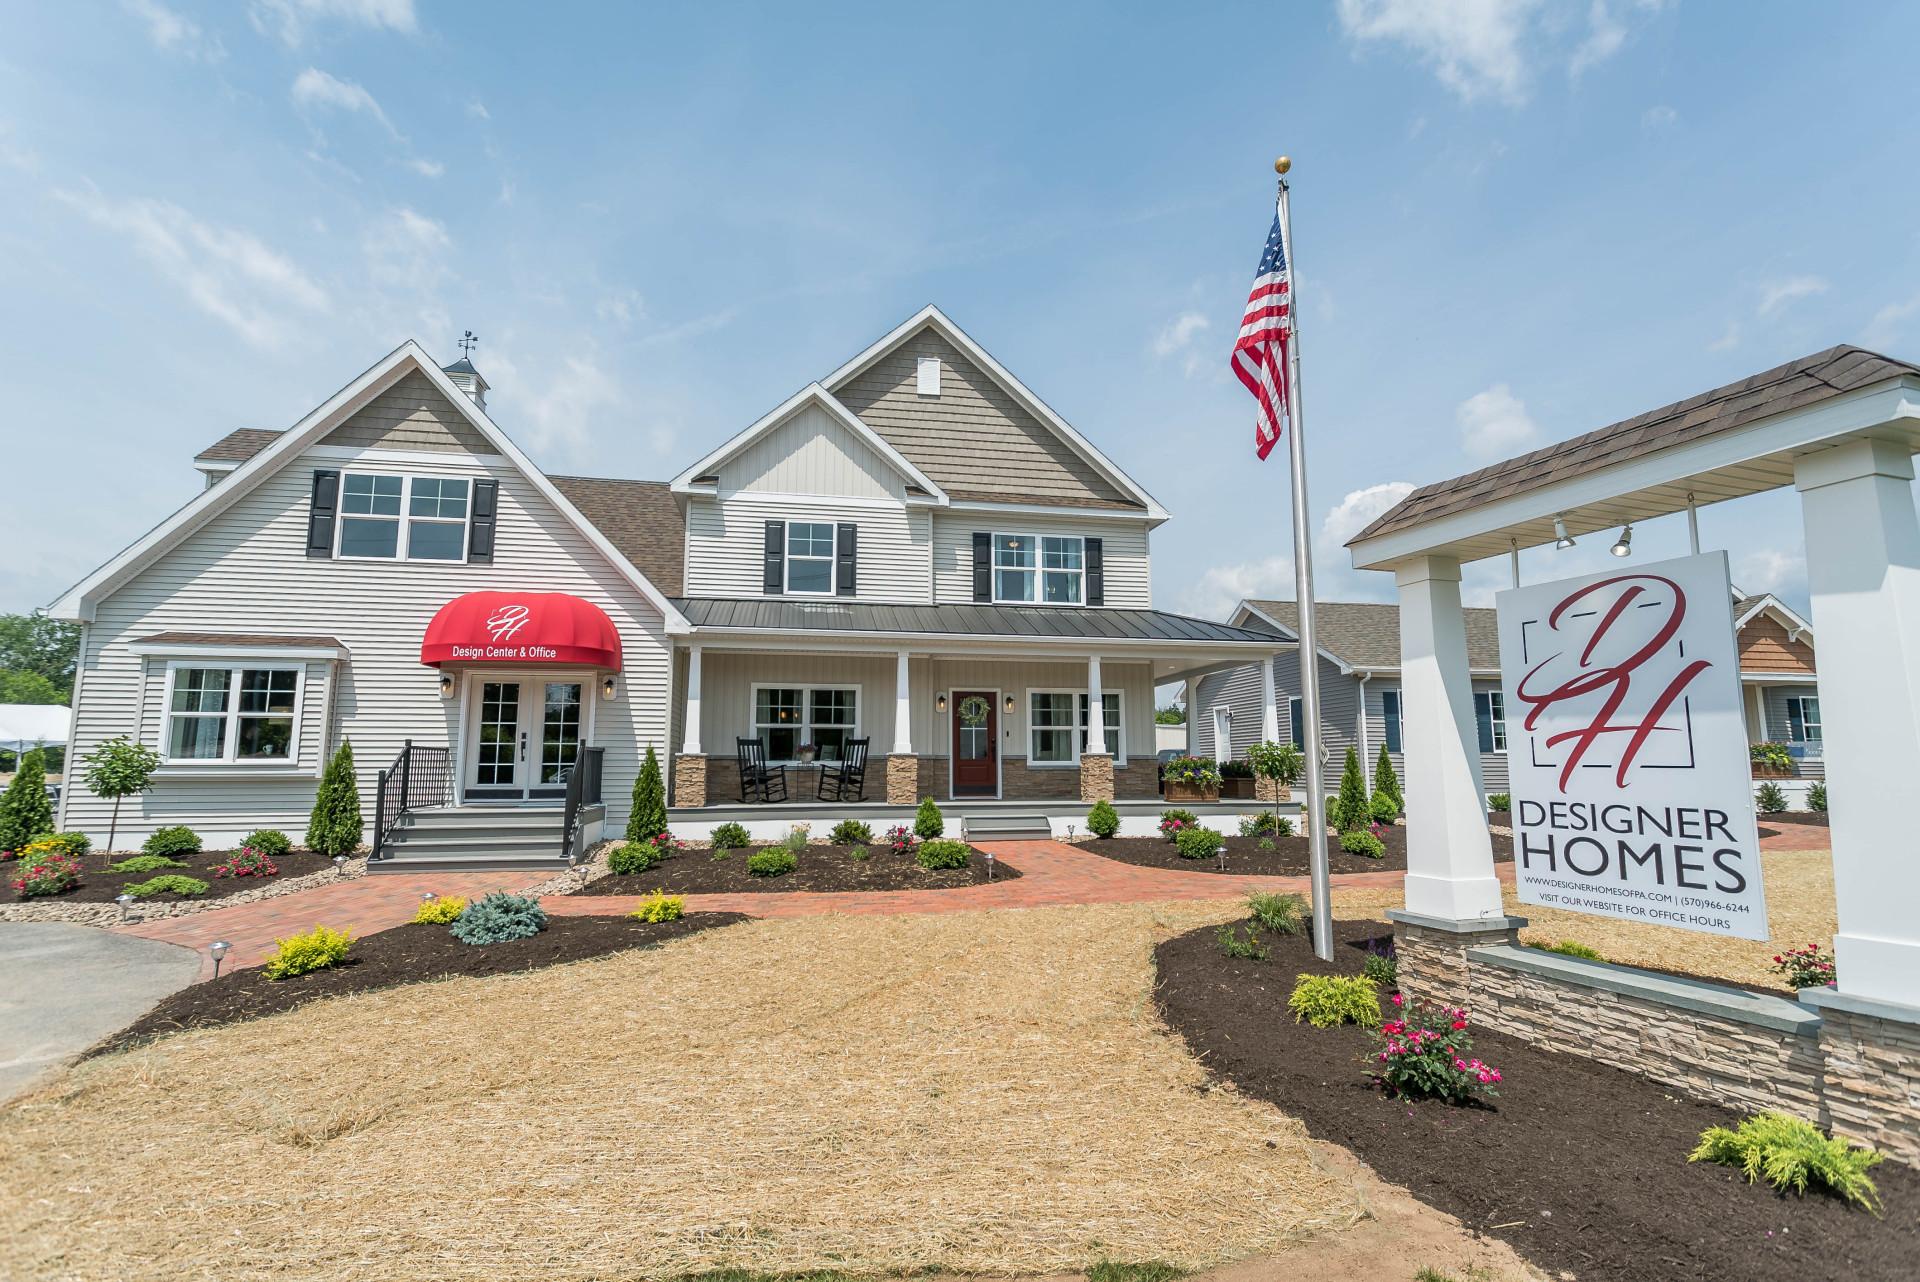 Designer Homes Of Pa Custom Modular Homes Tour Our Models In Mifflinburg